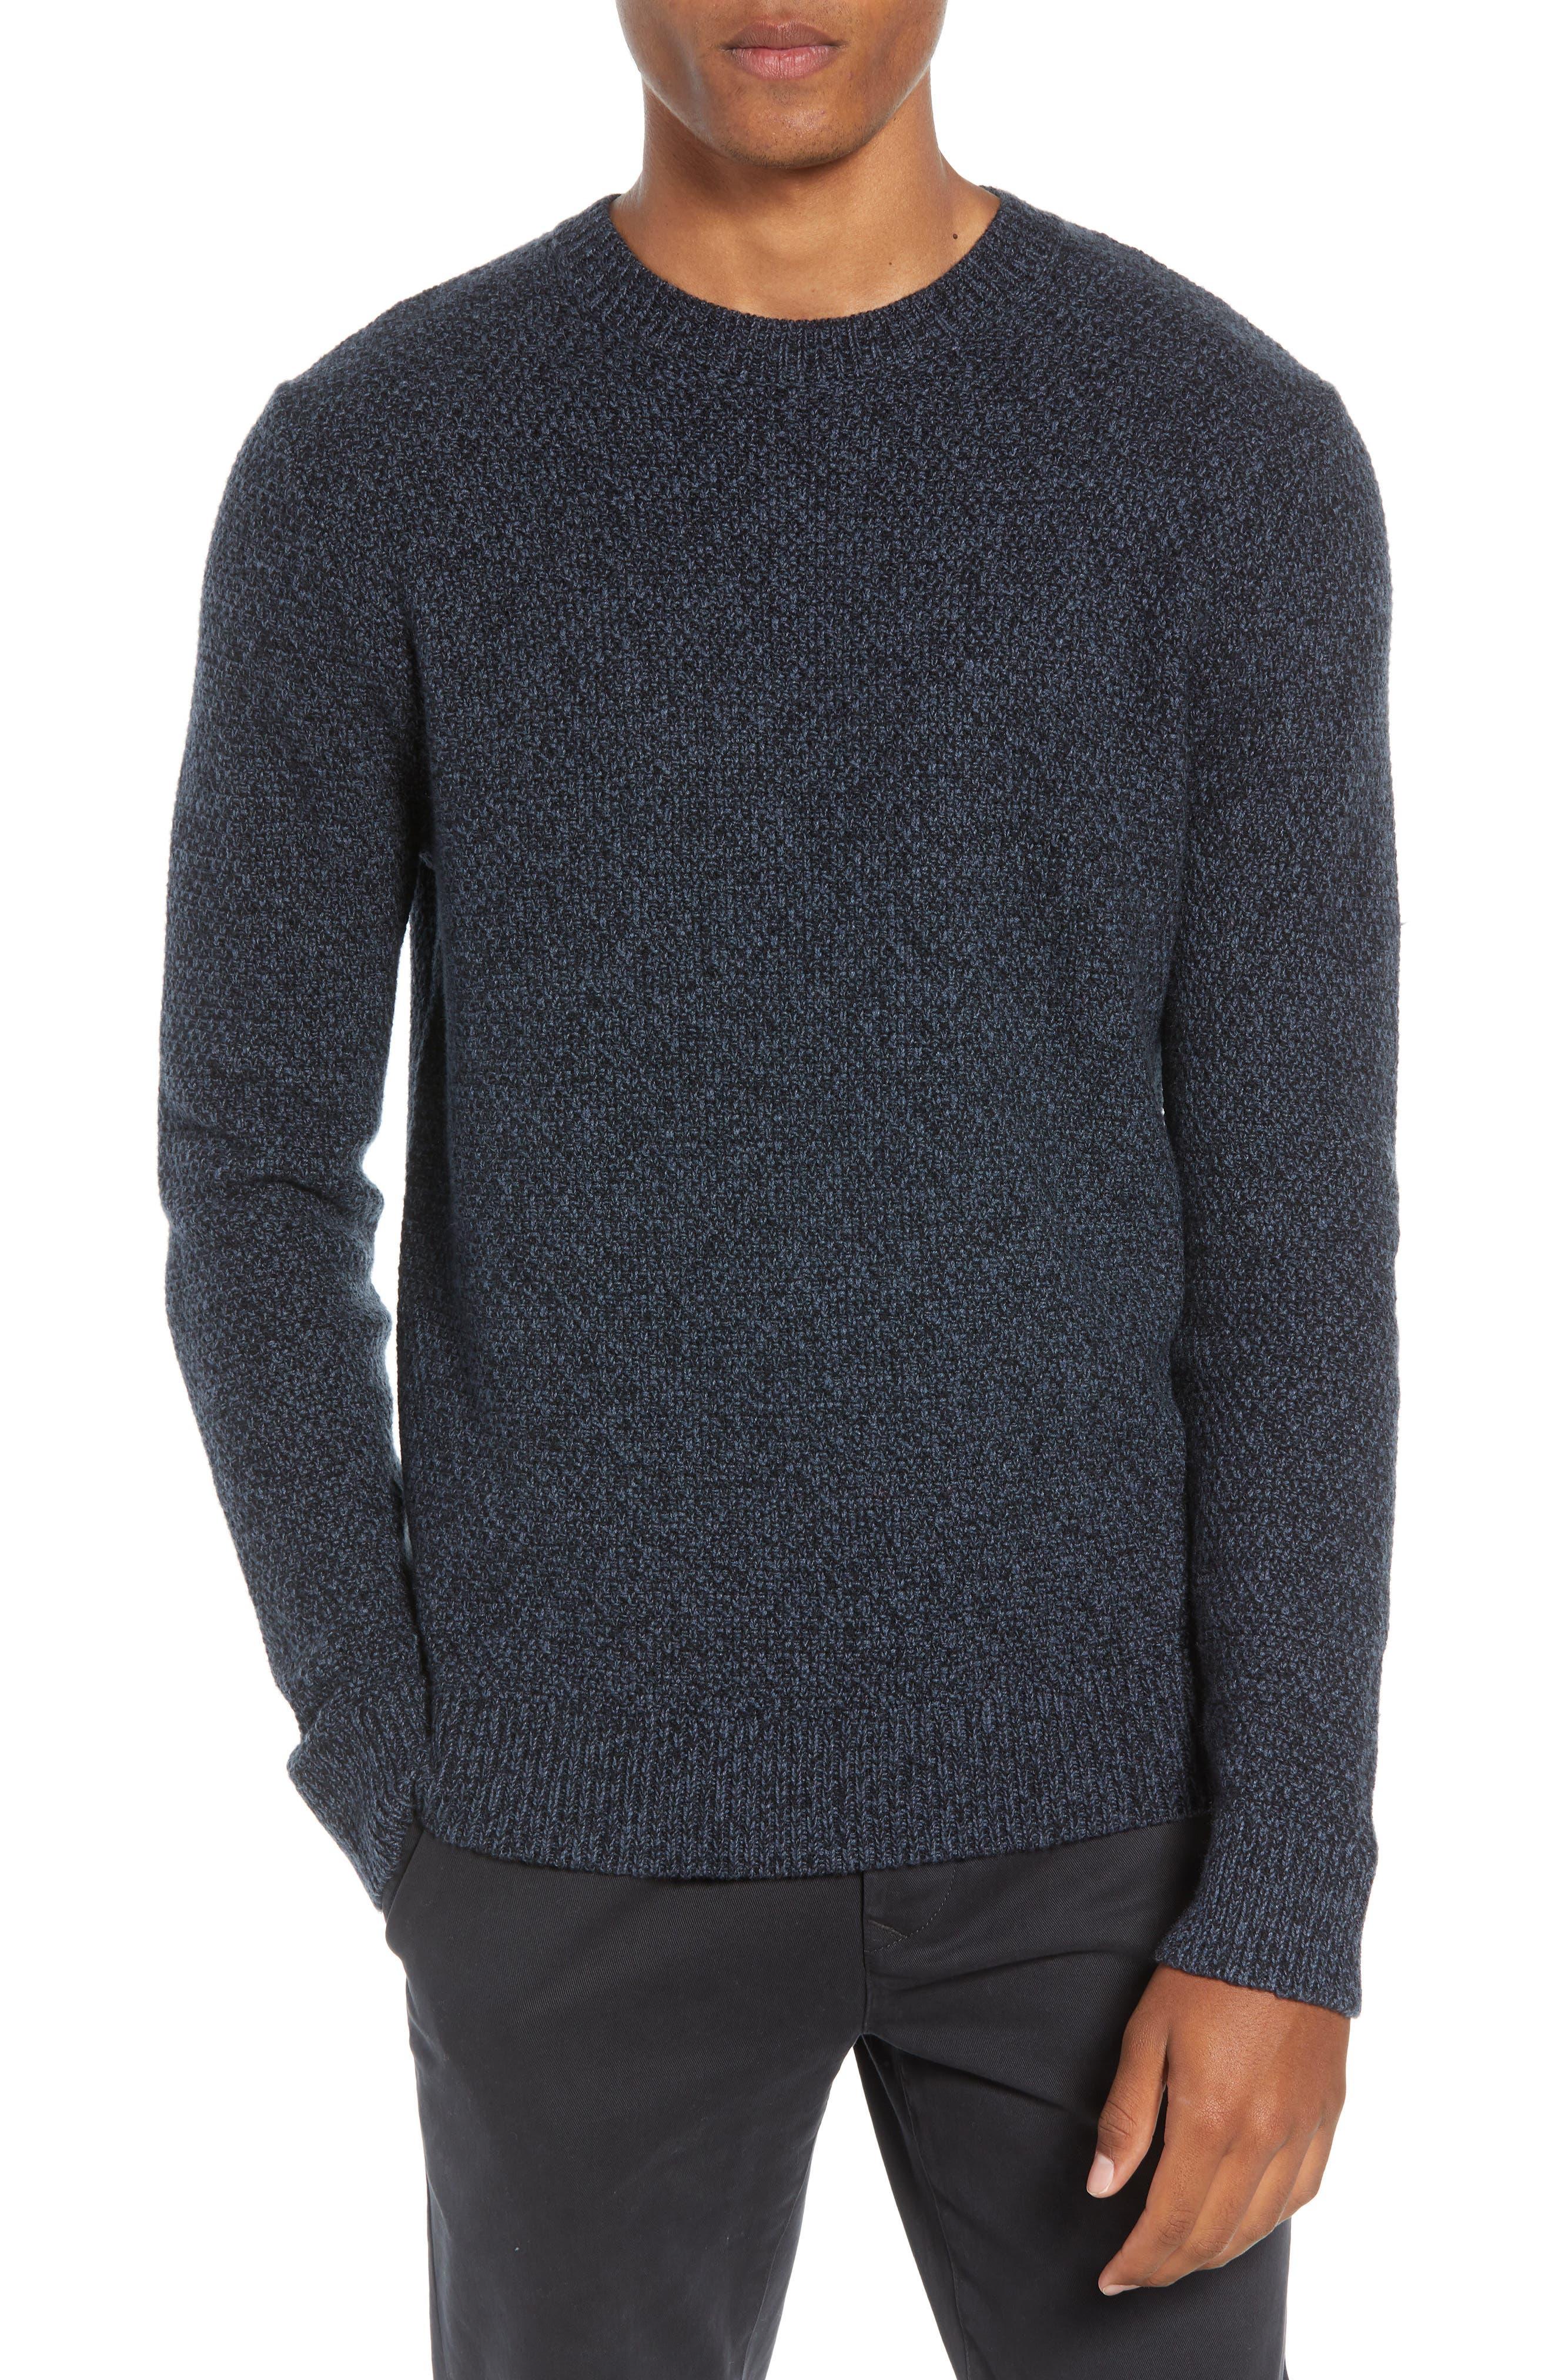 Montreal Slim Fit Crewneck Sweater,                             Main thumbnail 1, color,                             NAVY